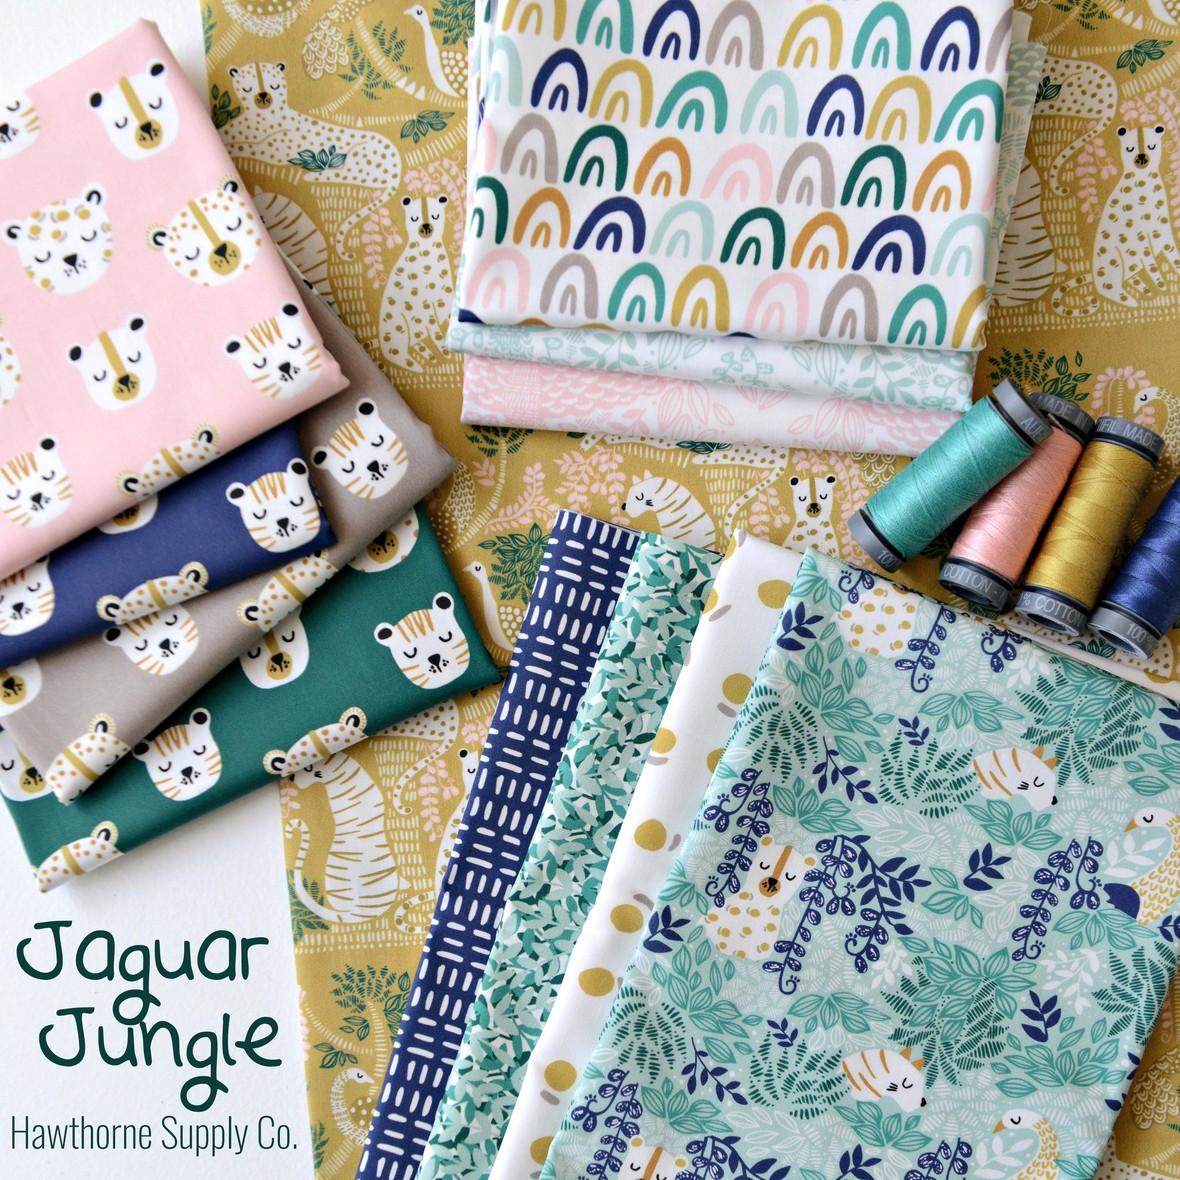 Jaguar Jungle Fabric Hawthorne Supply Co